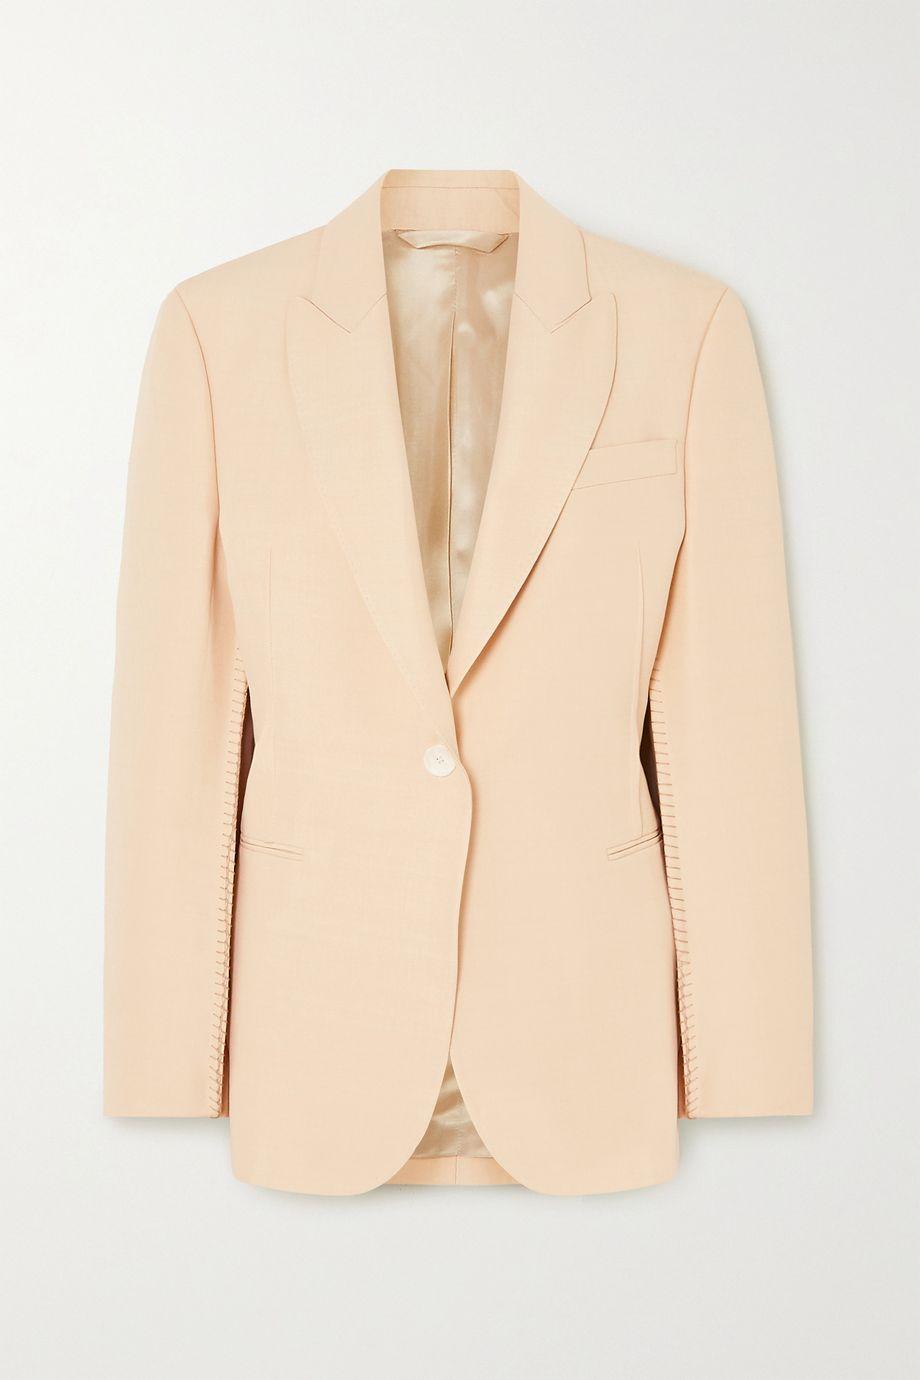 Acne Studios Whipstitched woven blazer